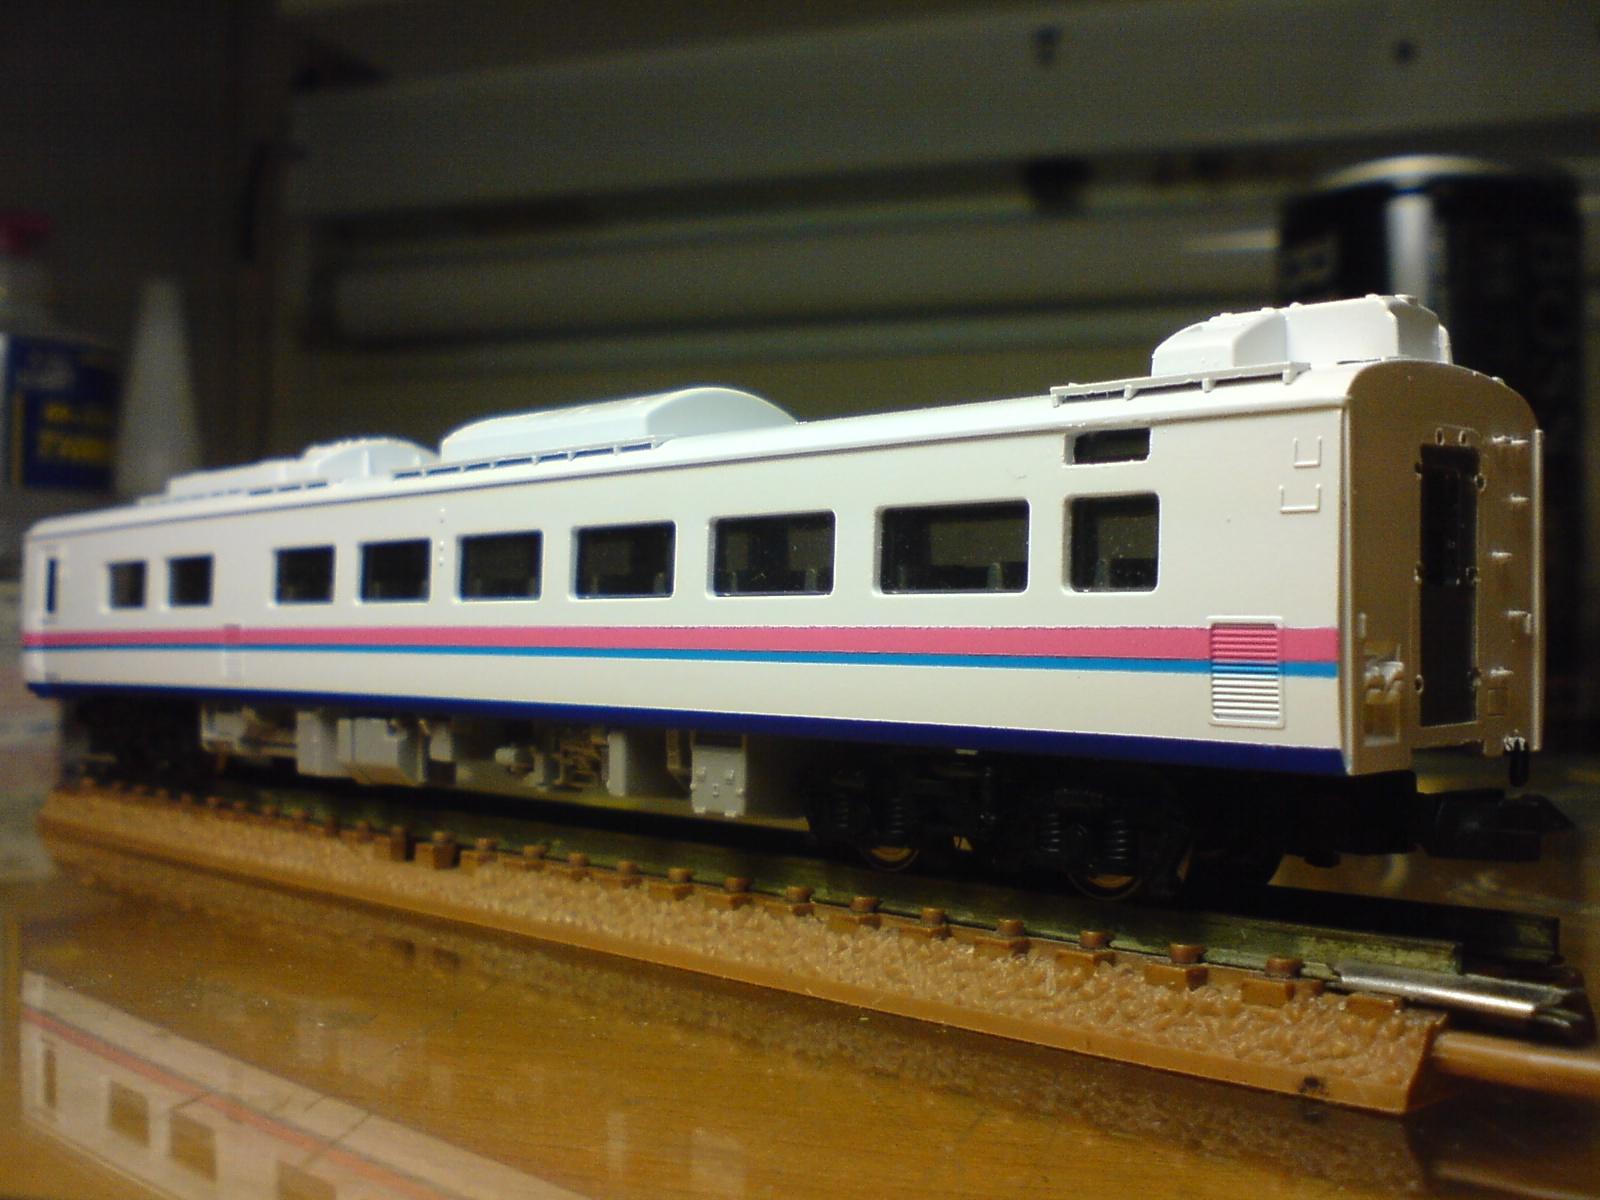 Kc380055